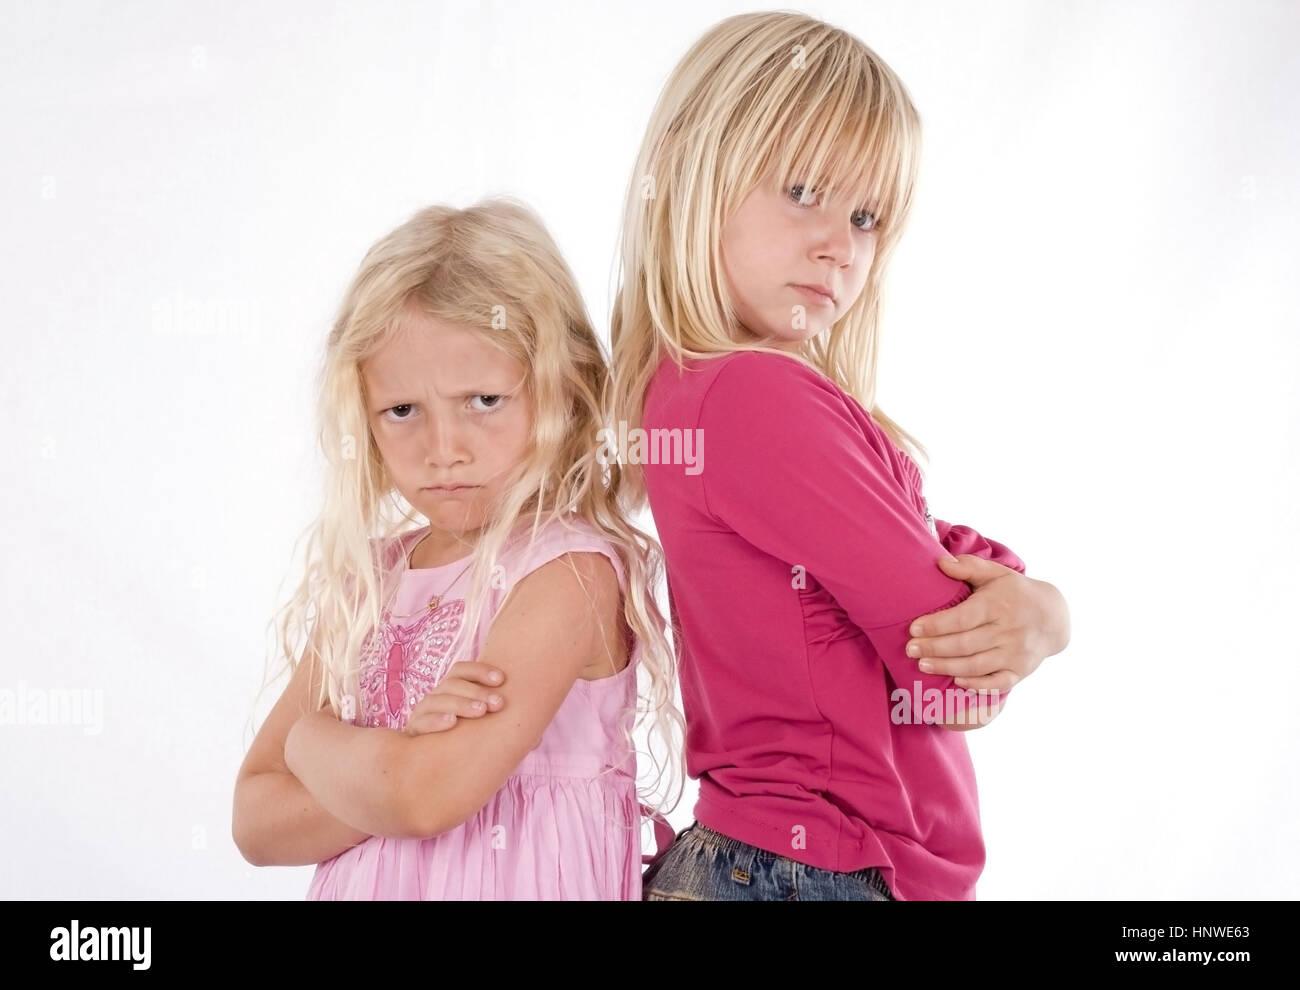 Model release, Zwei beleidigte Maedchen - two affronted girls Stock Photo